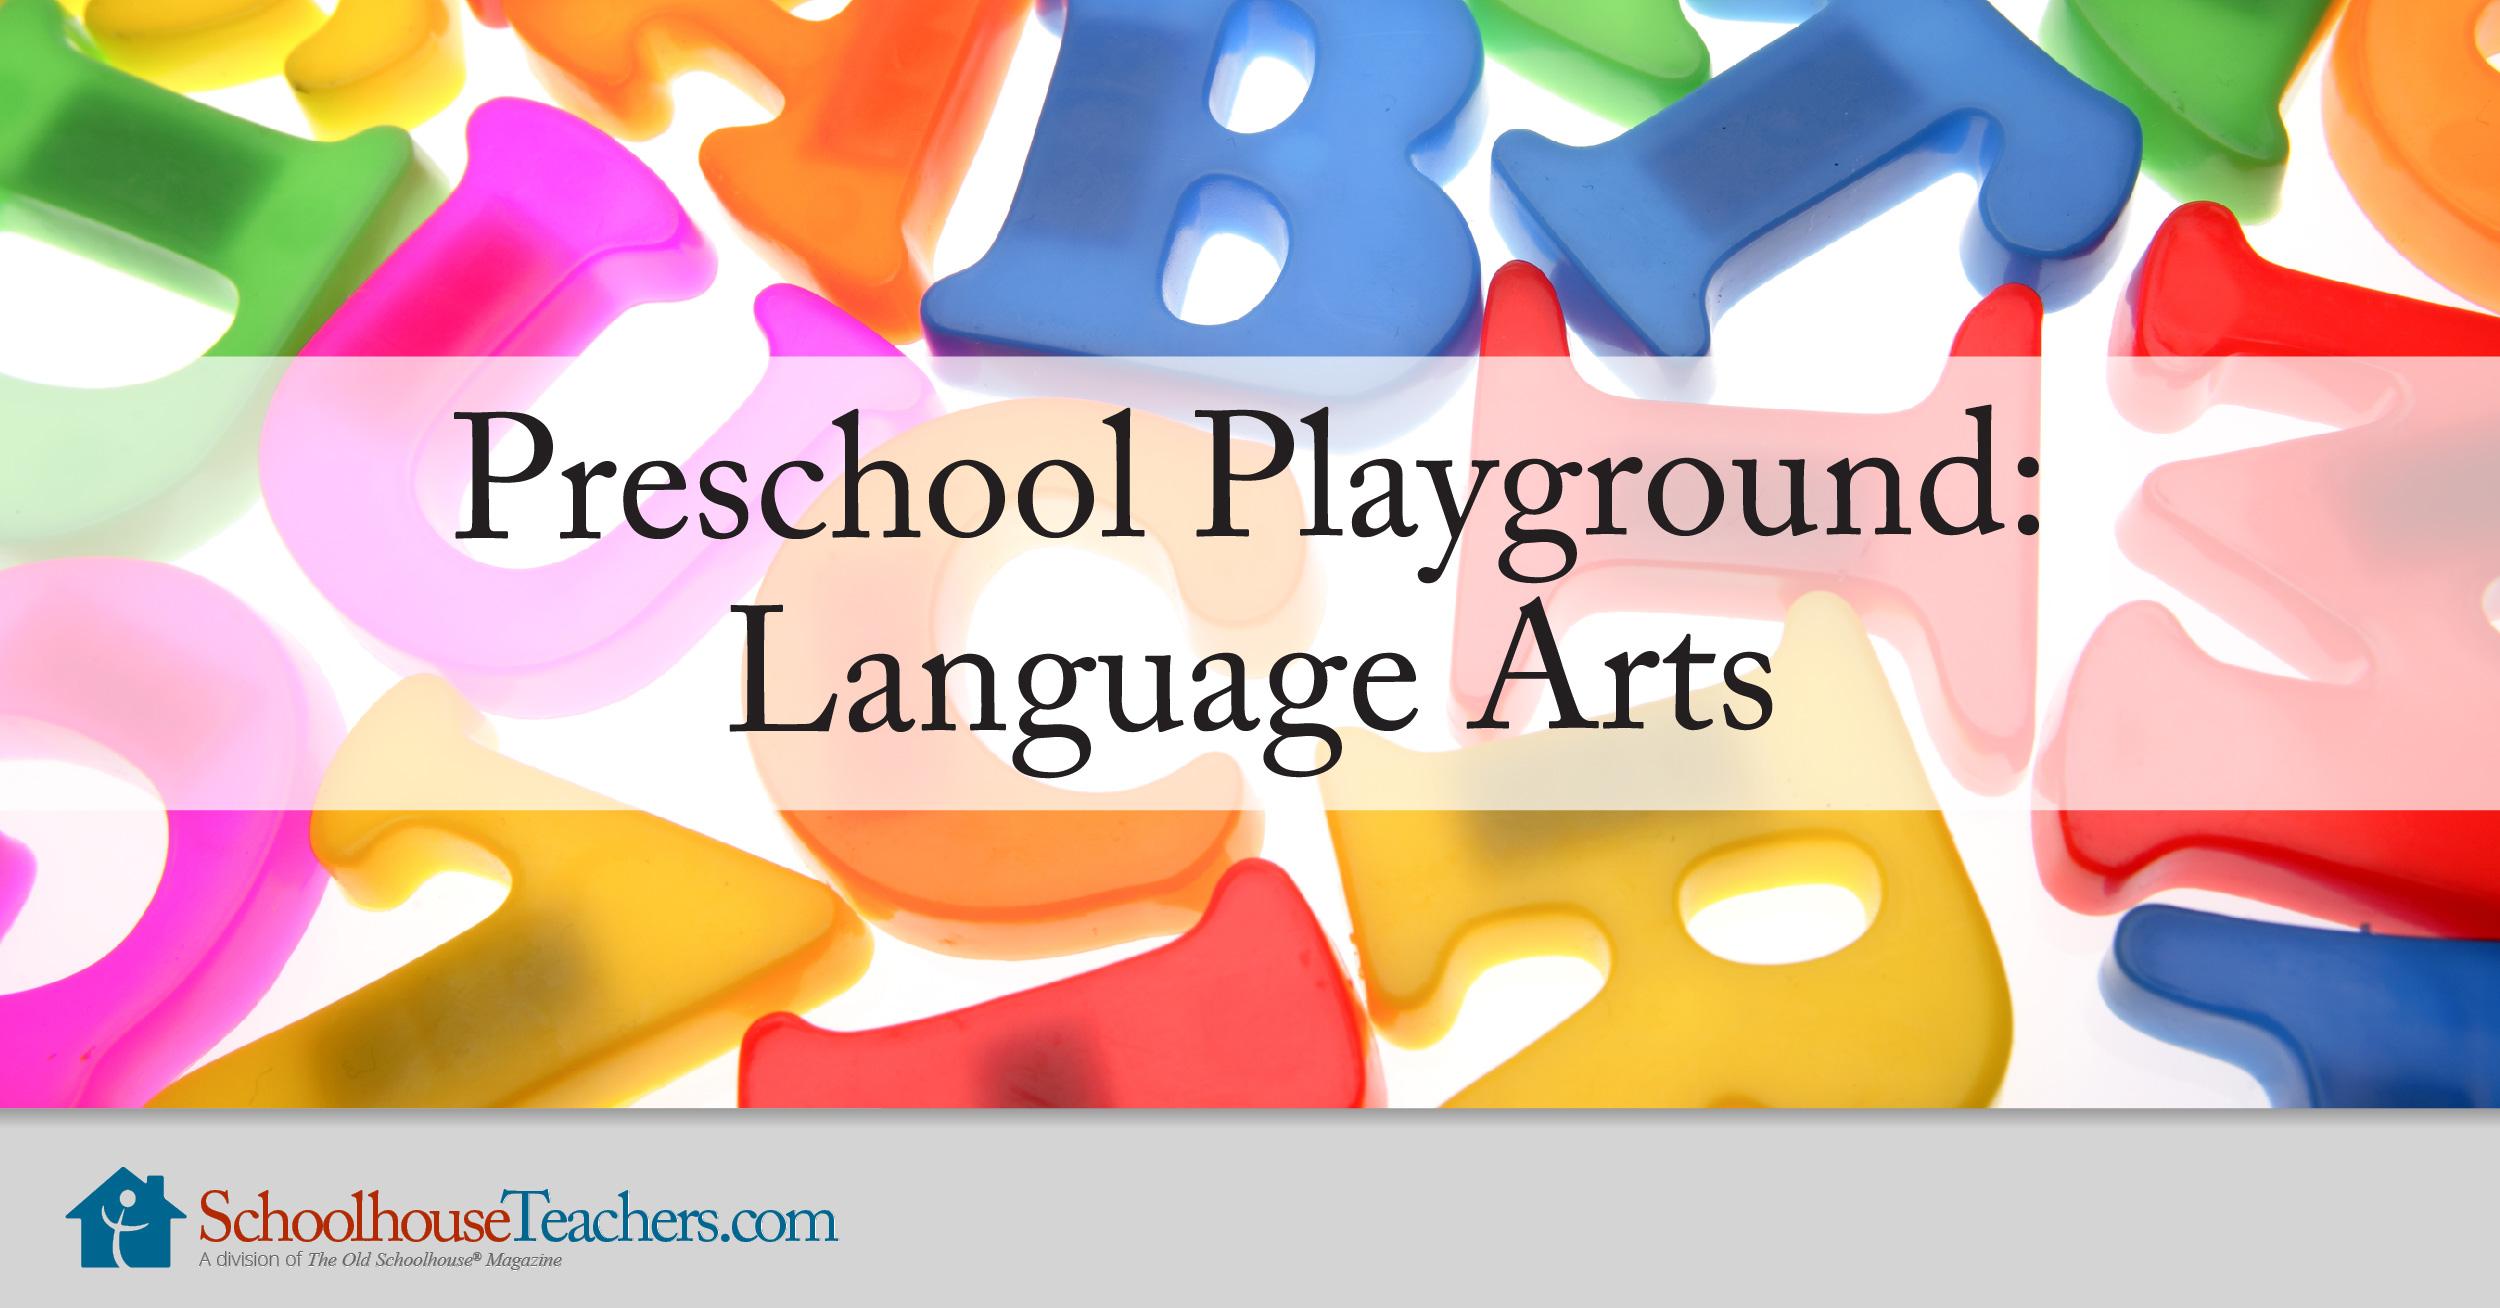 Preschool Playground Homeschool Language Arts Course